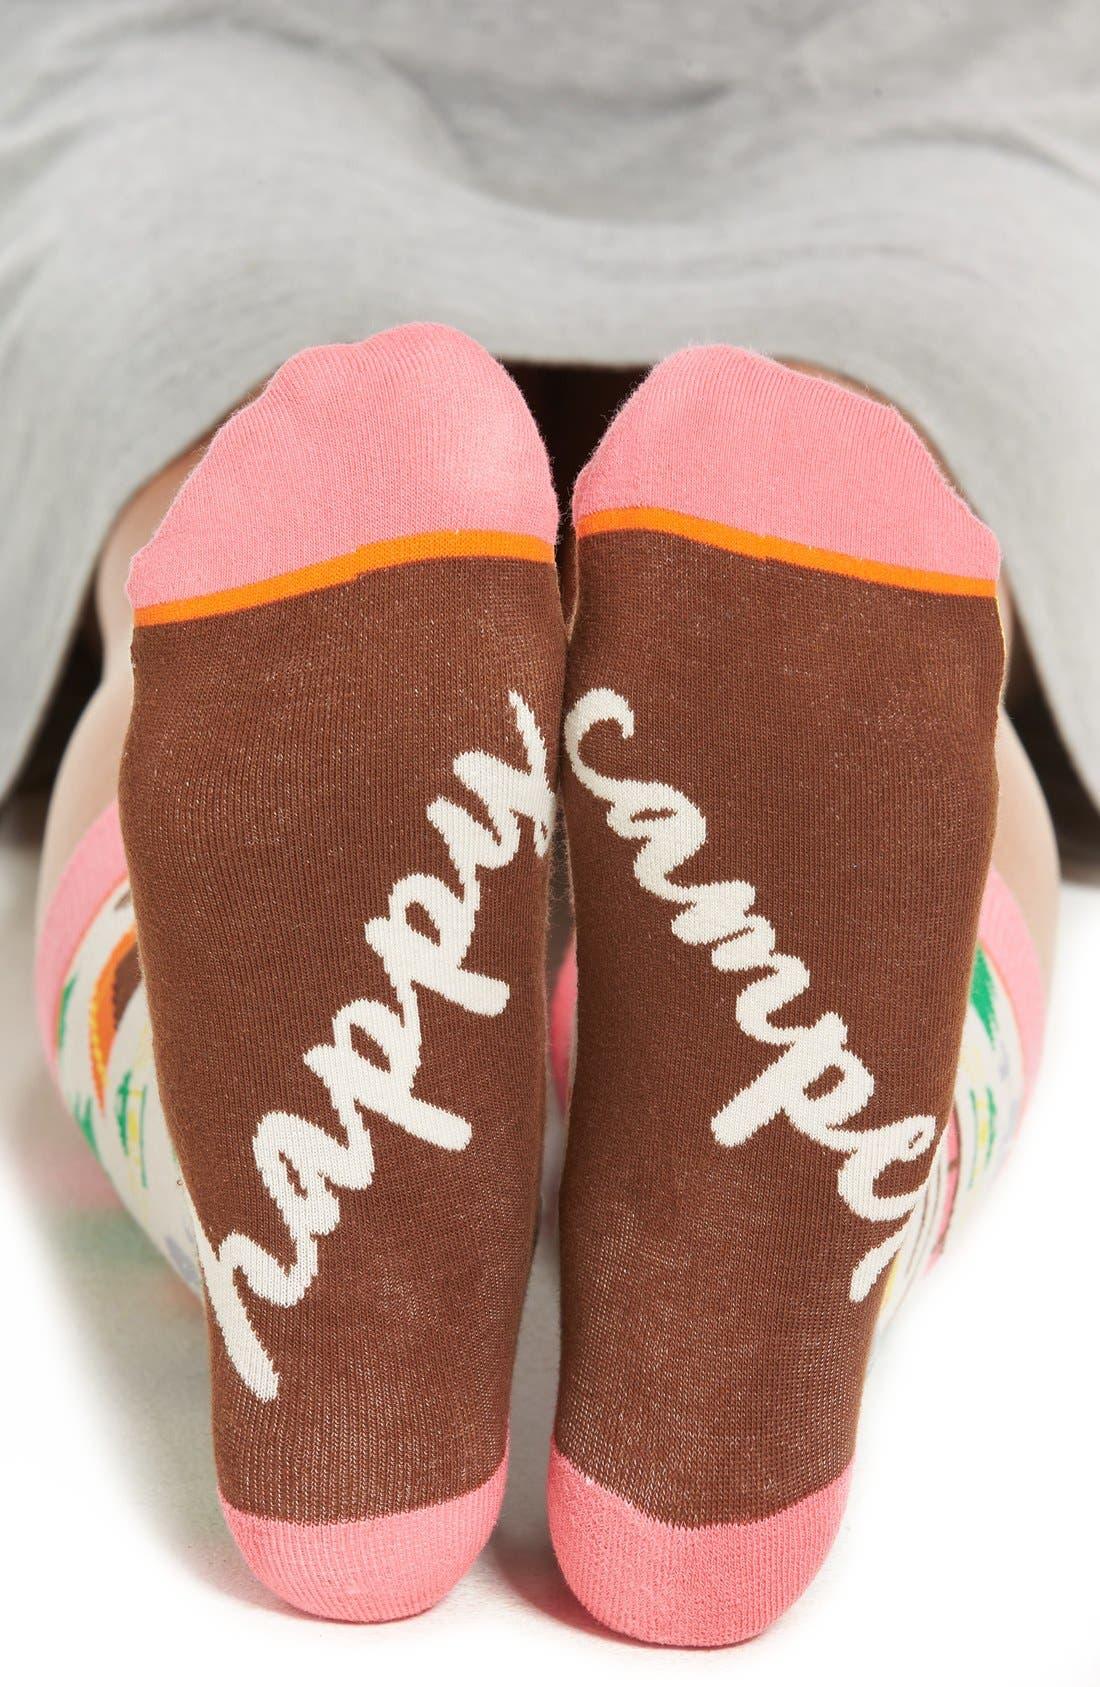 WOVEN PEAR 'Happy Camper' Crew Socks, Main, color, 650